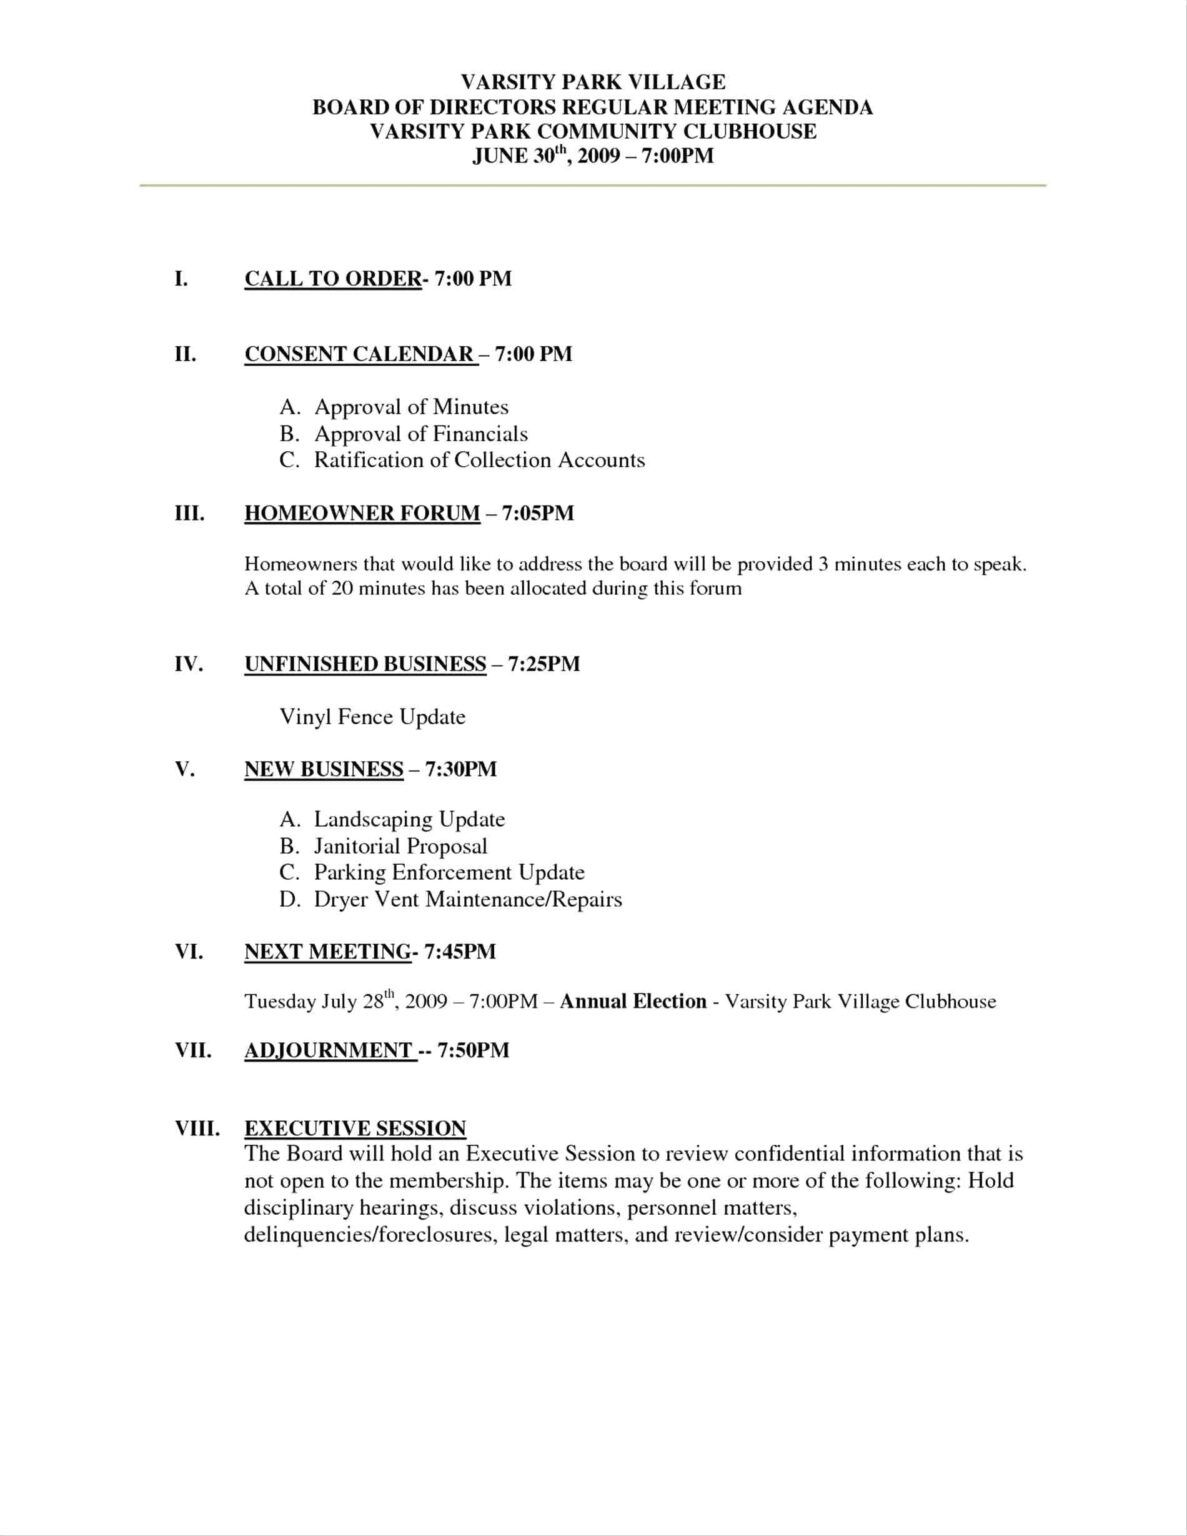 12 13 Word Agenda Vorlage Fur Meetings Ithacar Pertaining To Corporate Minutes Template Word In 2020 Meeting Agenda Template Meeting Agenda Agenda Template